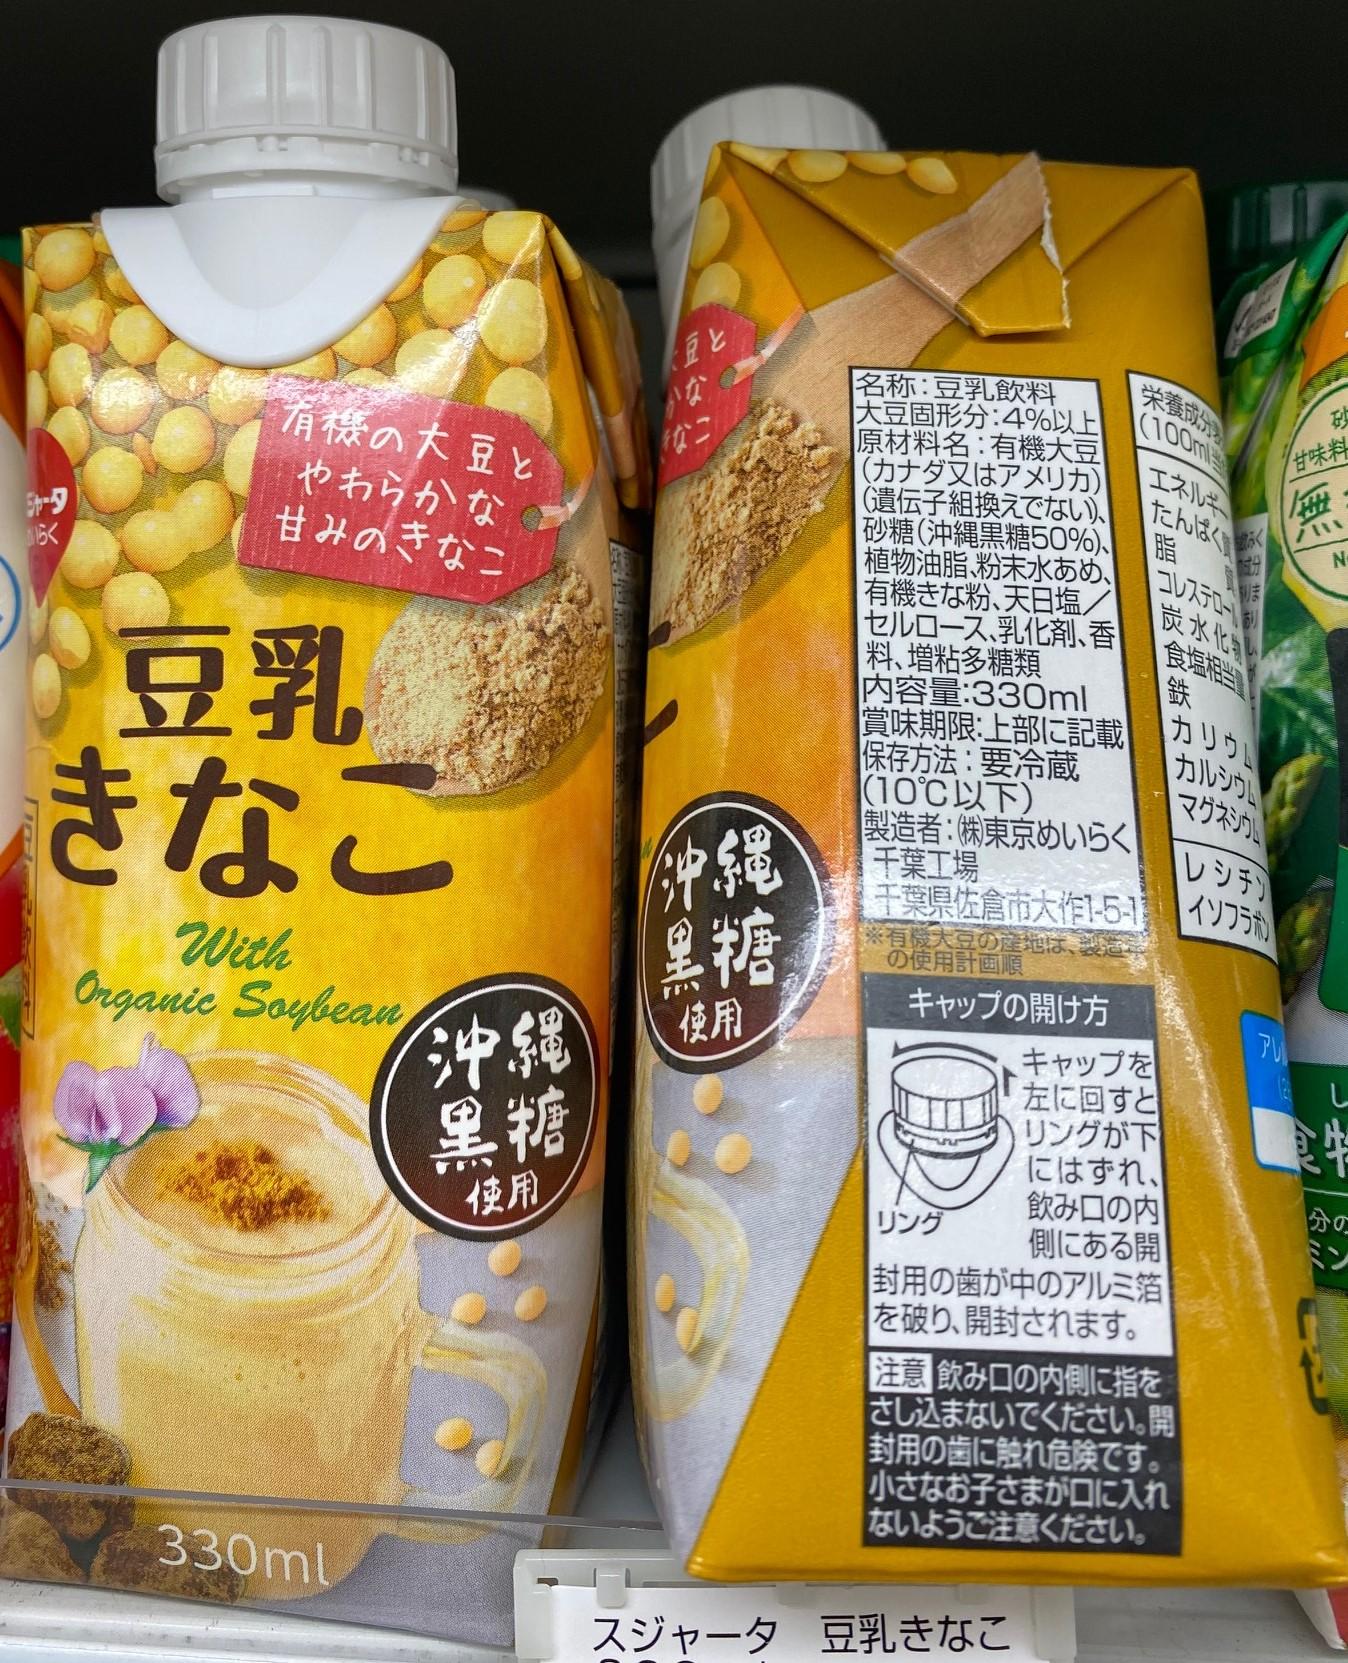 Sujahta Roasted Soybean Flour Soymilk with Organic Soybeans